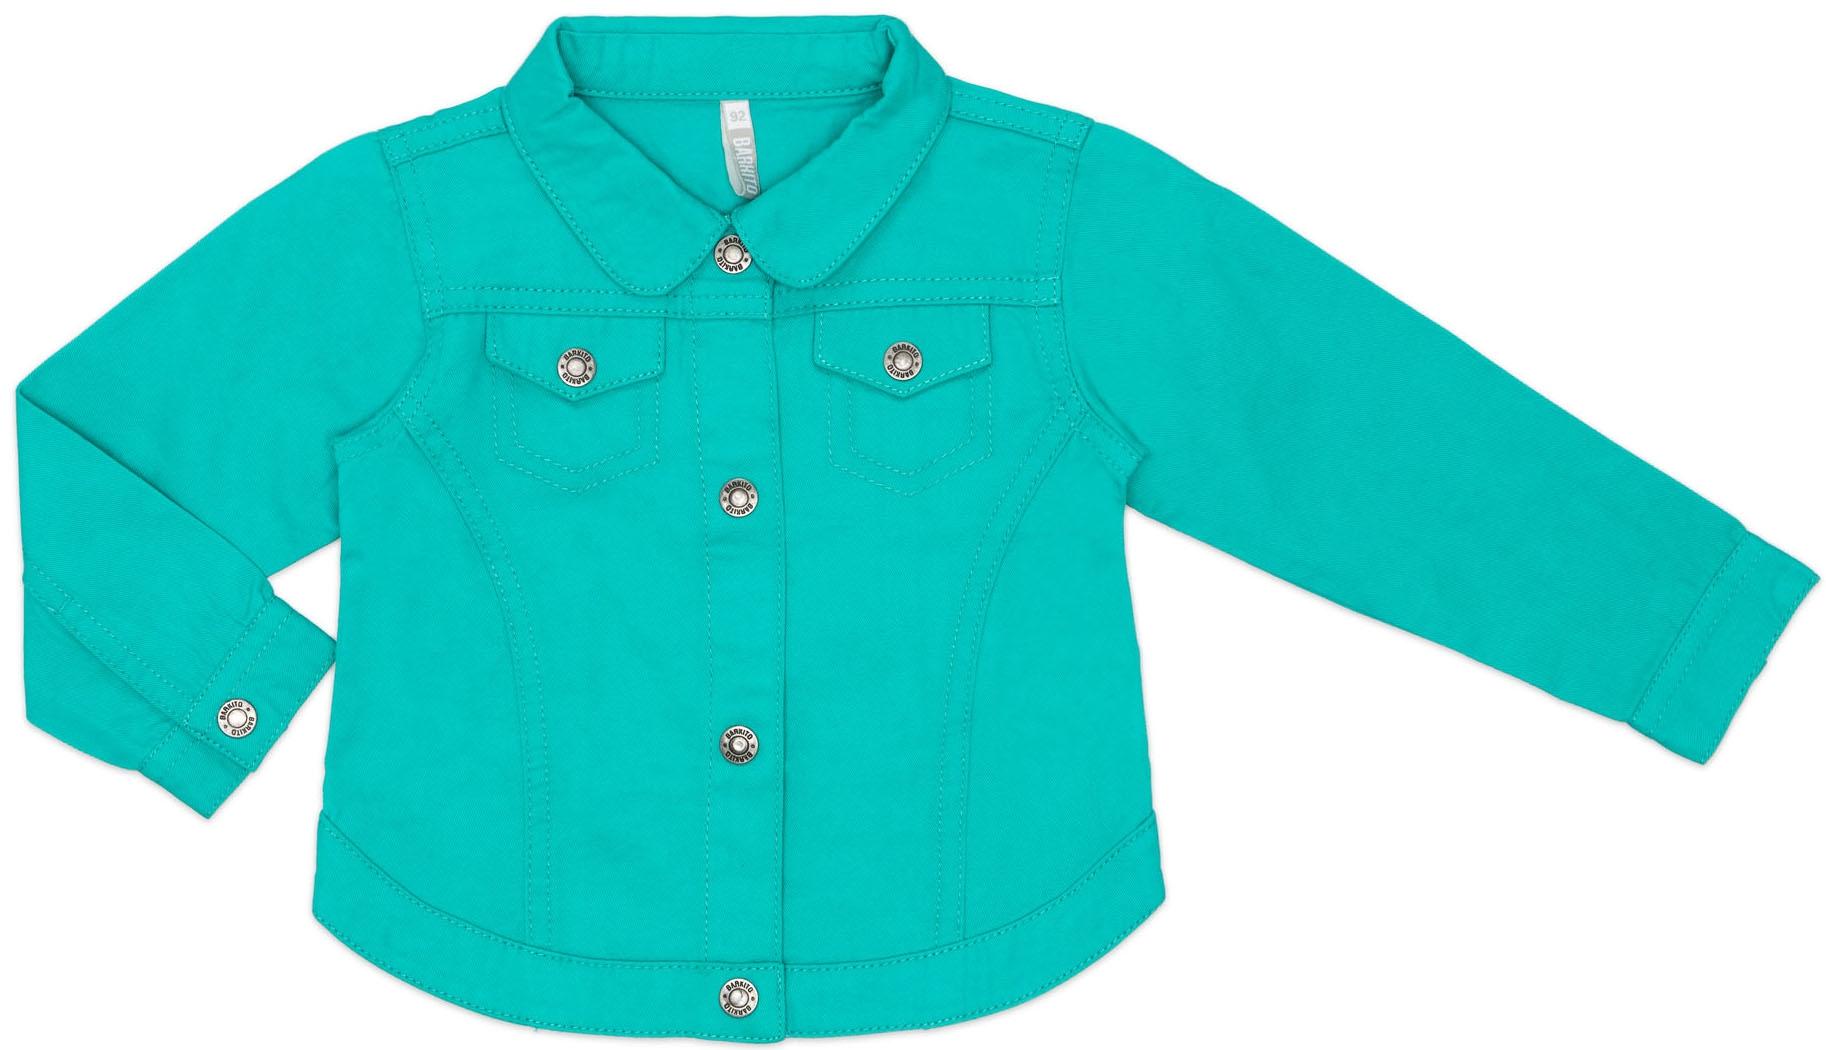 Куртка для девочки Barkito Алоха Гавайи! платья barkito платье без рукавов barkito алоха гавайи белое